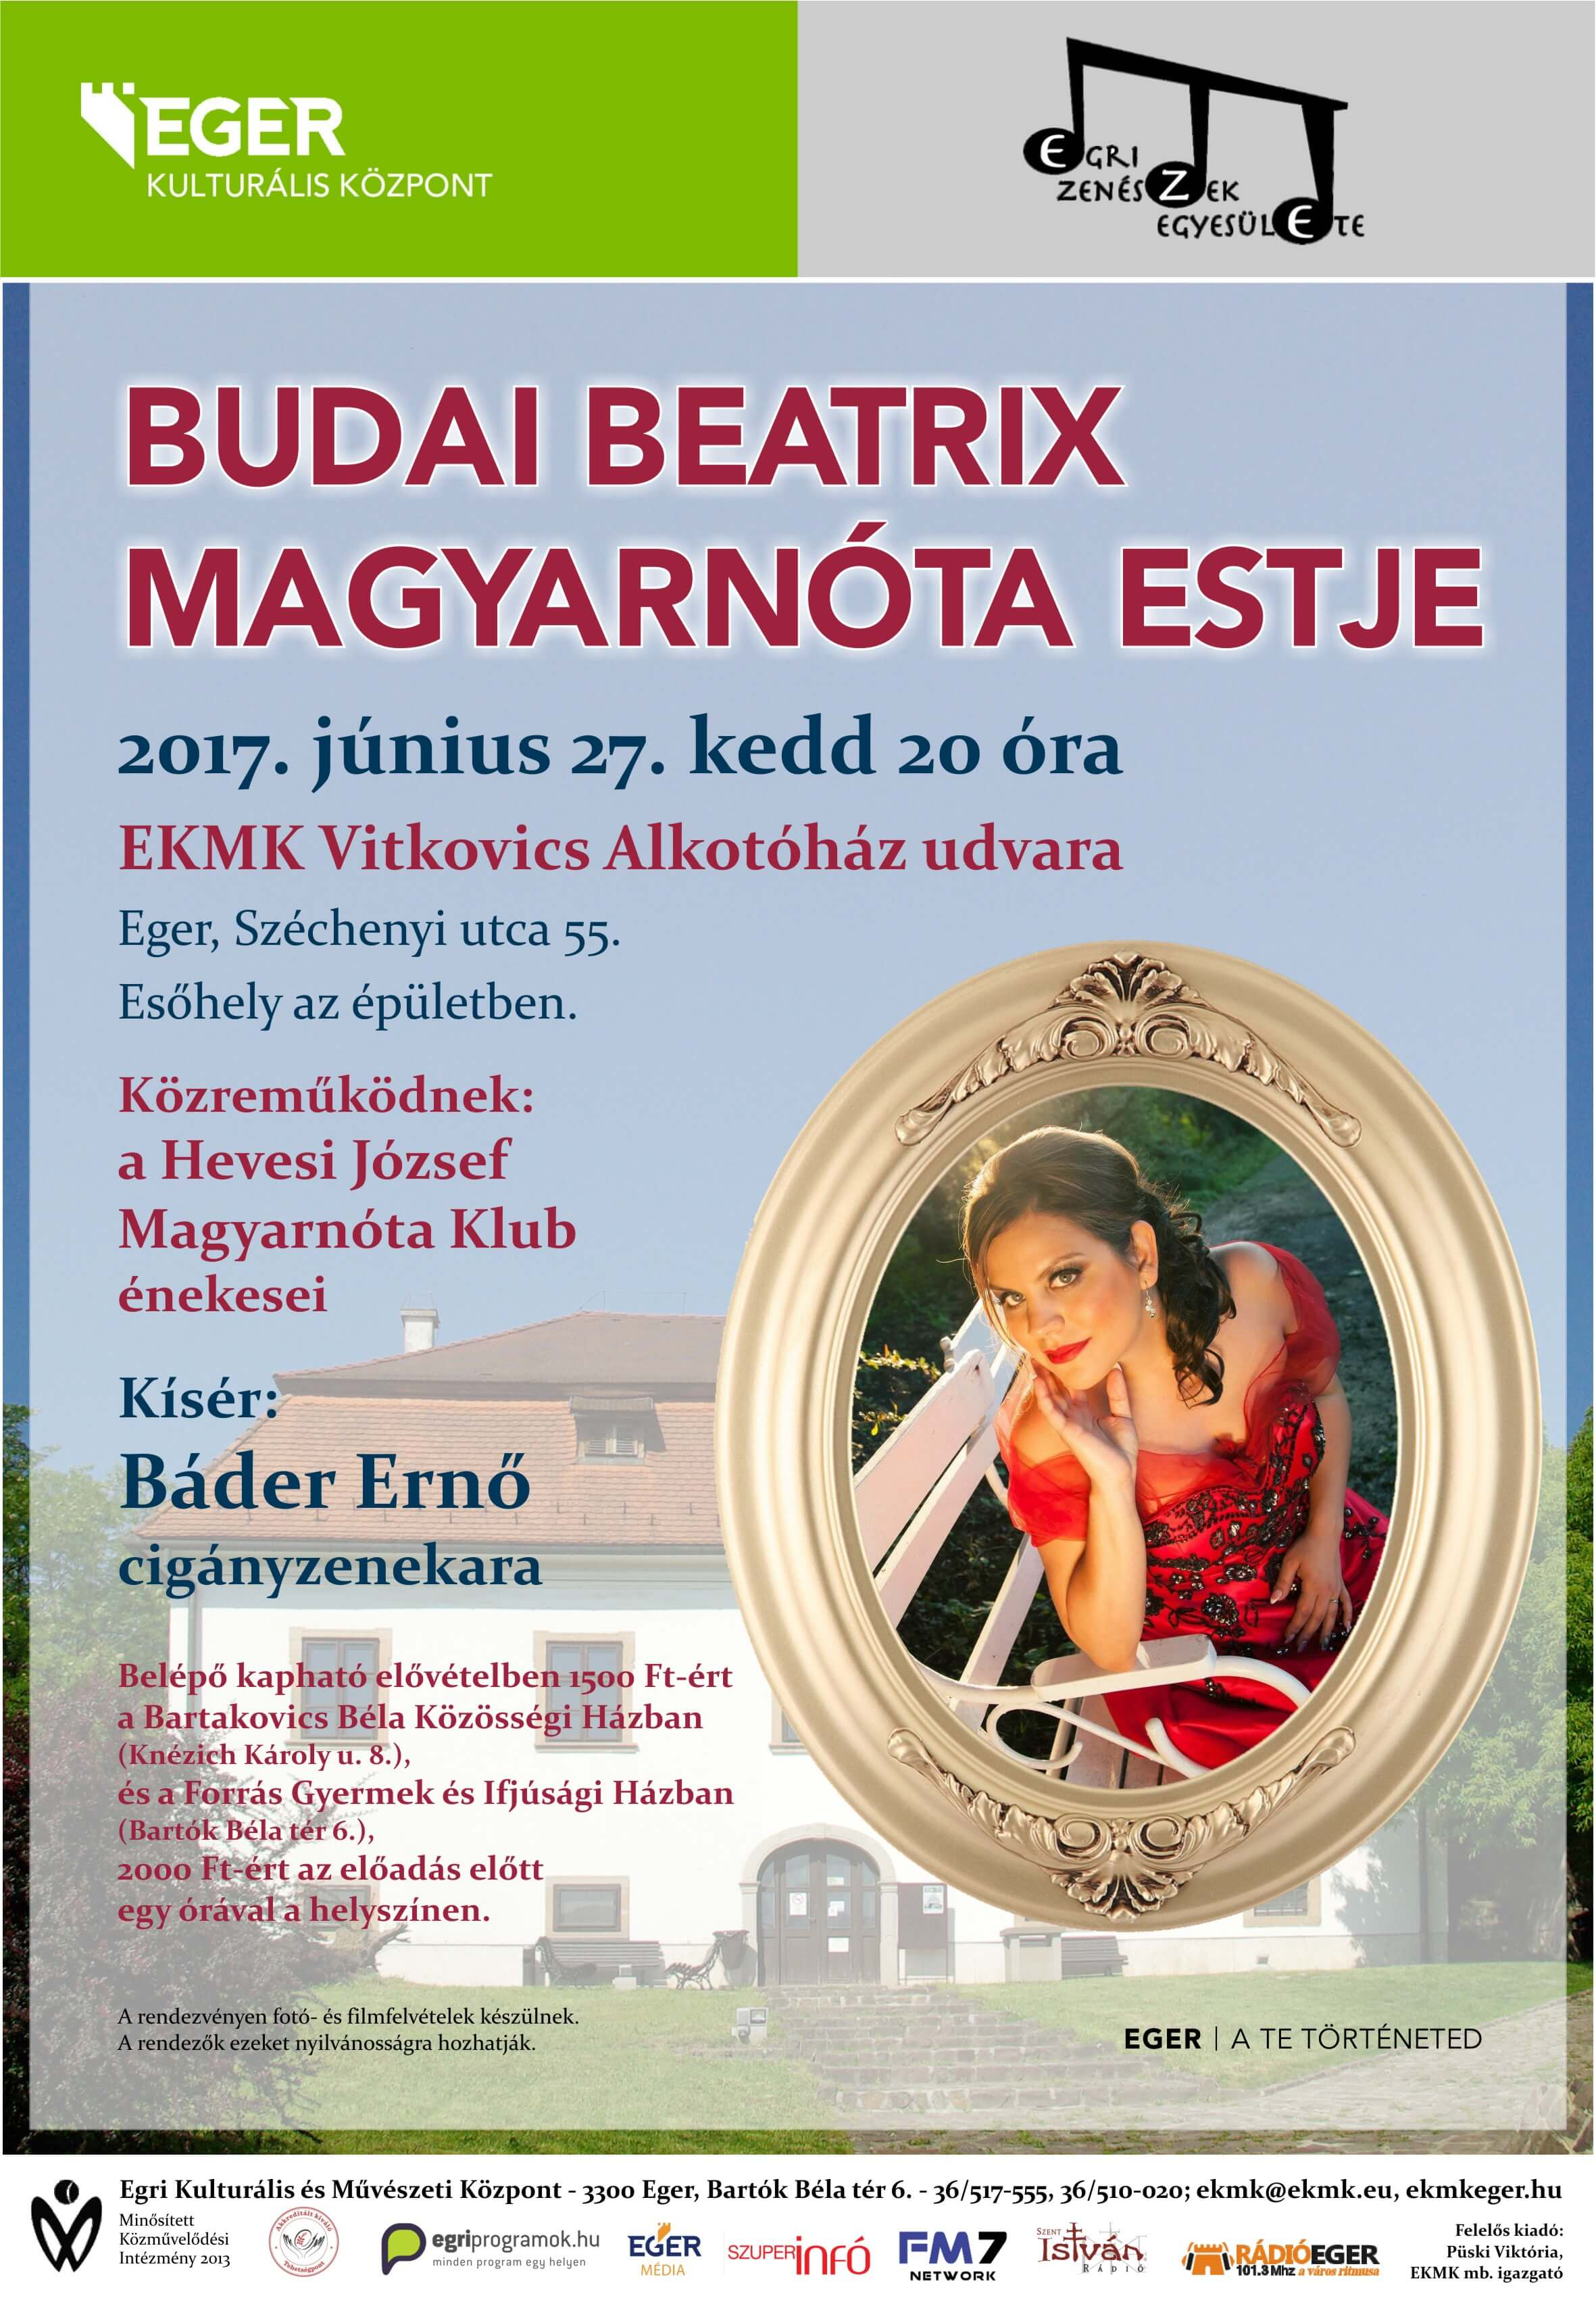 budai_beatrix_magyarnota_estje_2034070_7288.jpg